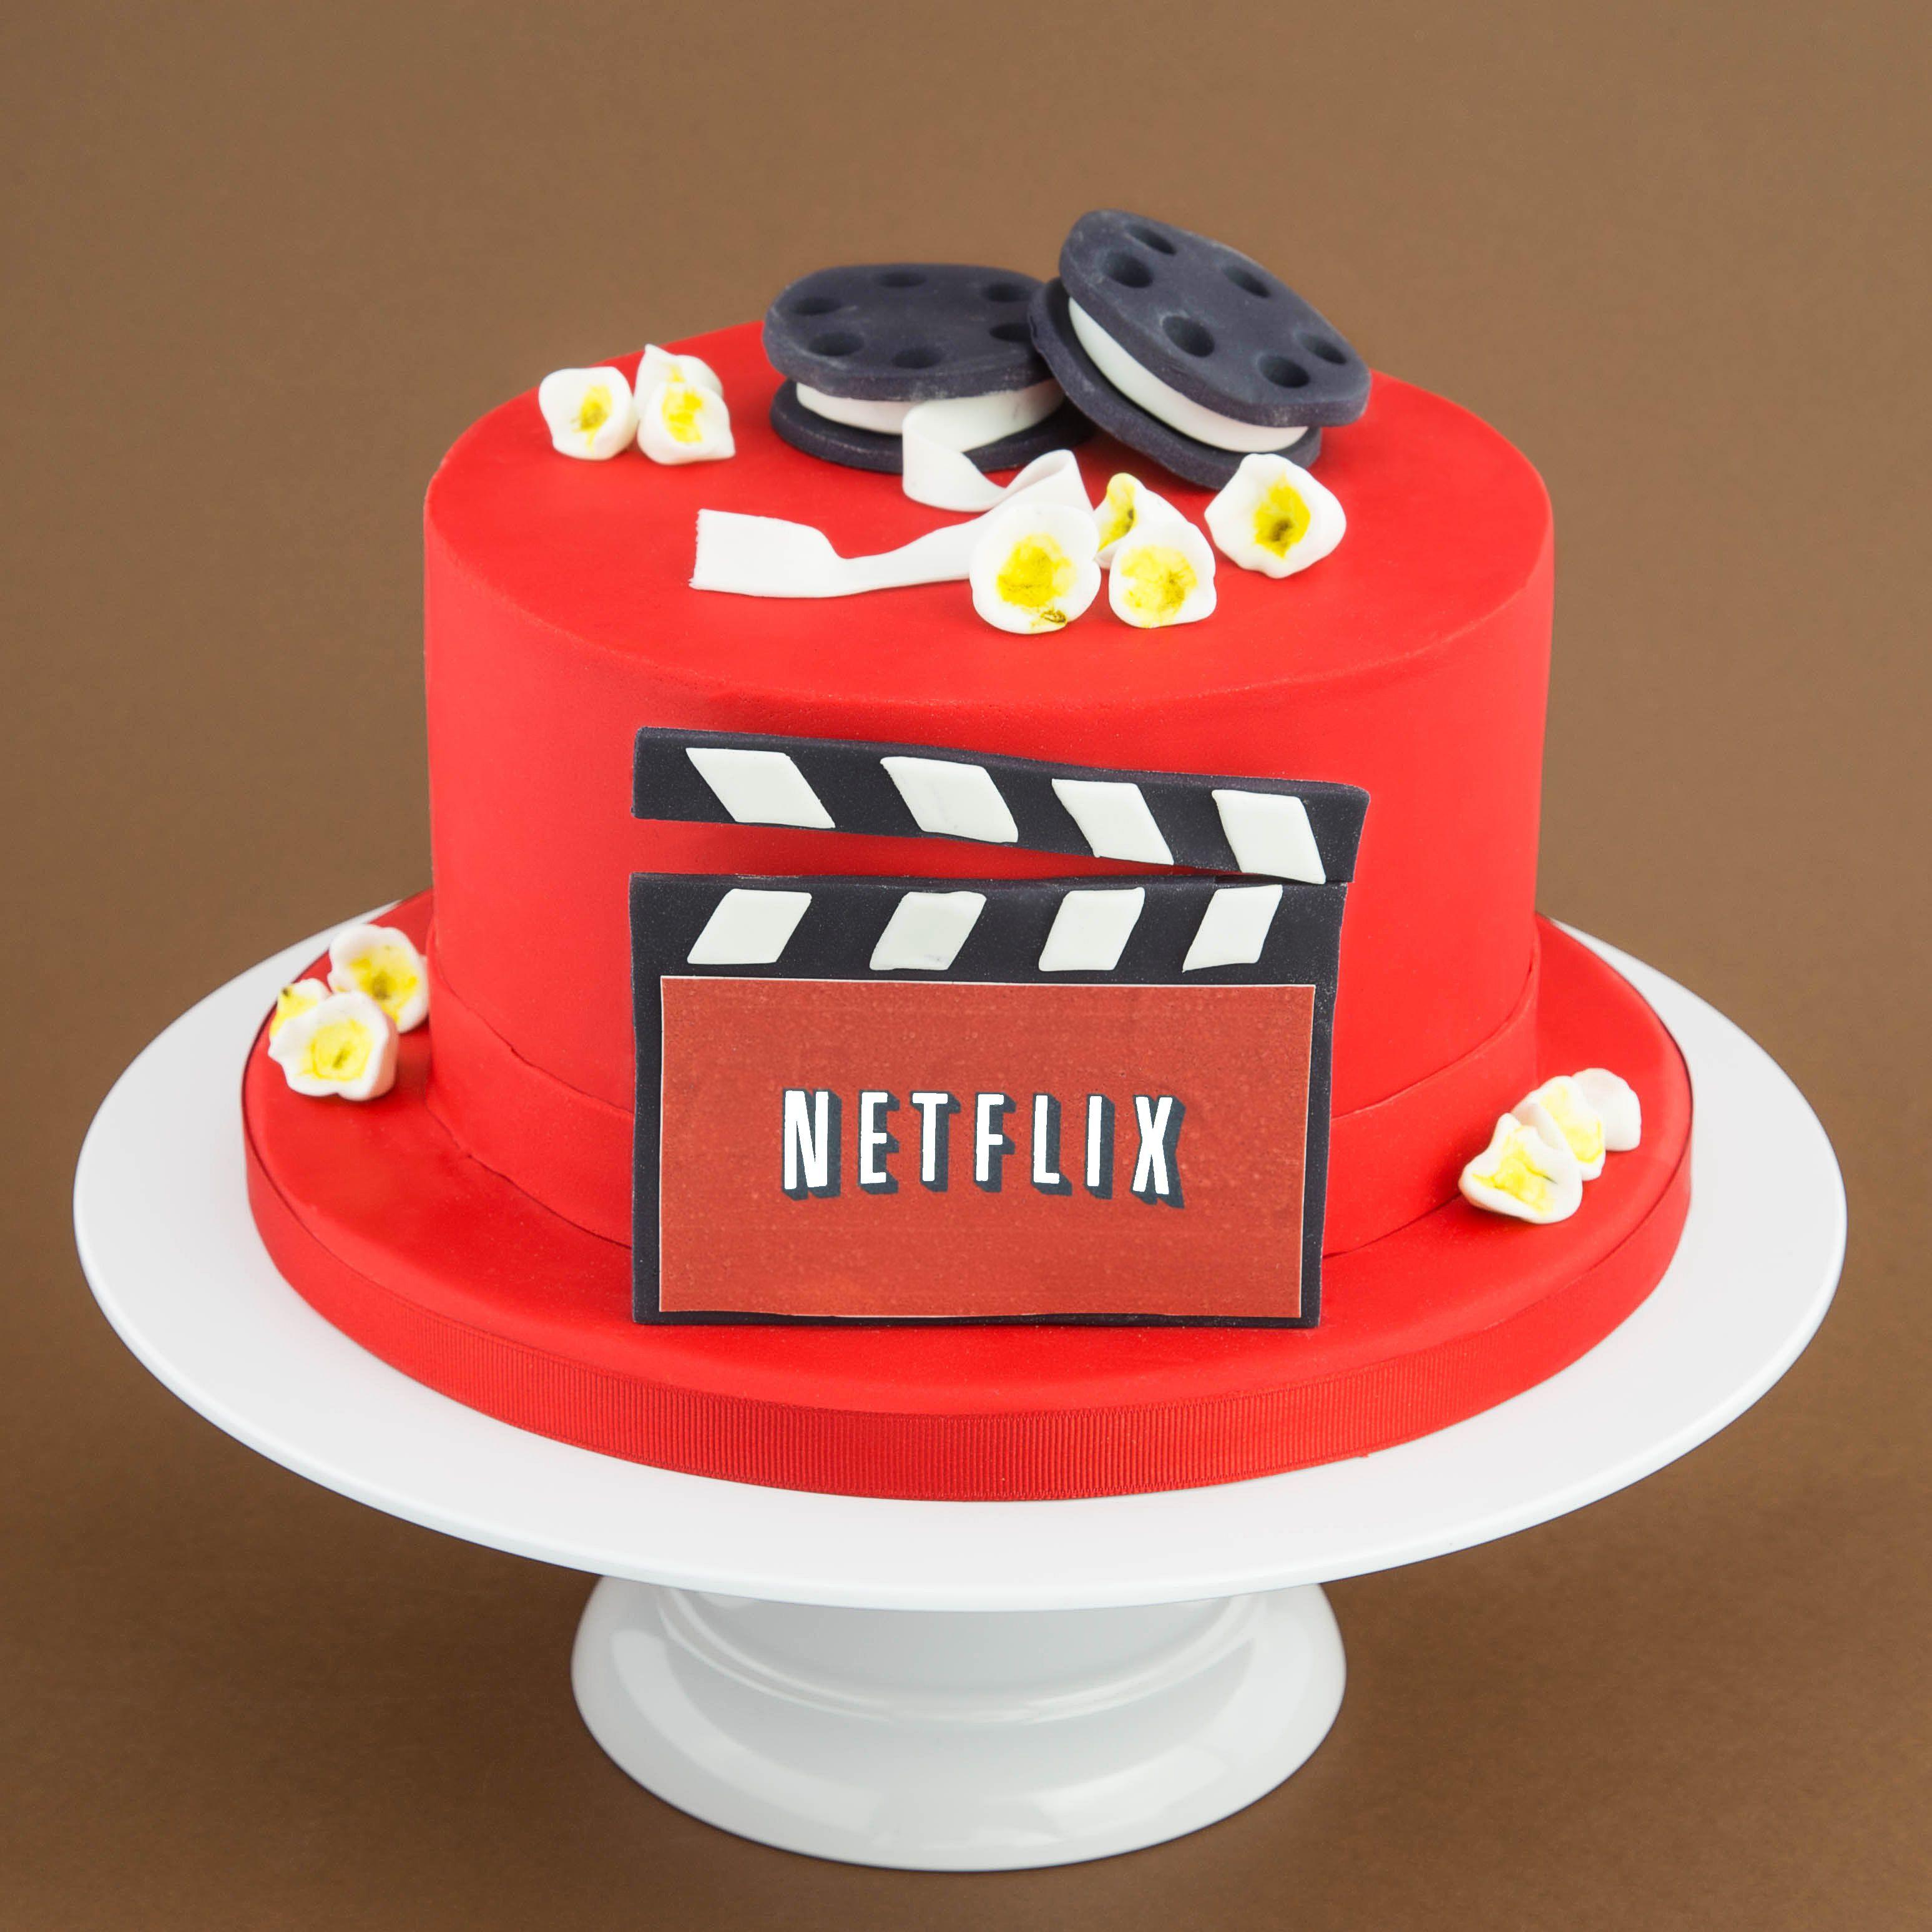 Netflix Cake Idea Fondant Icing Birthday